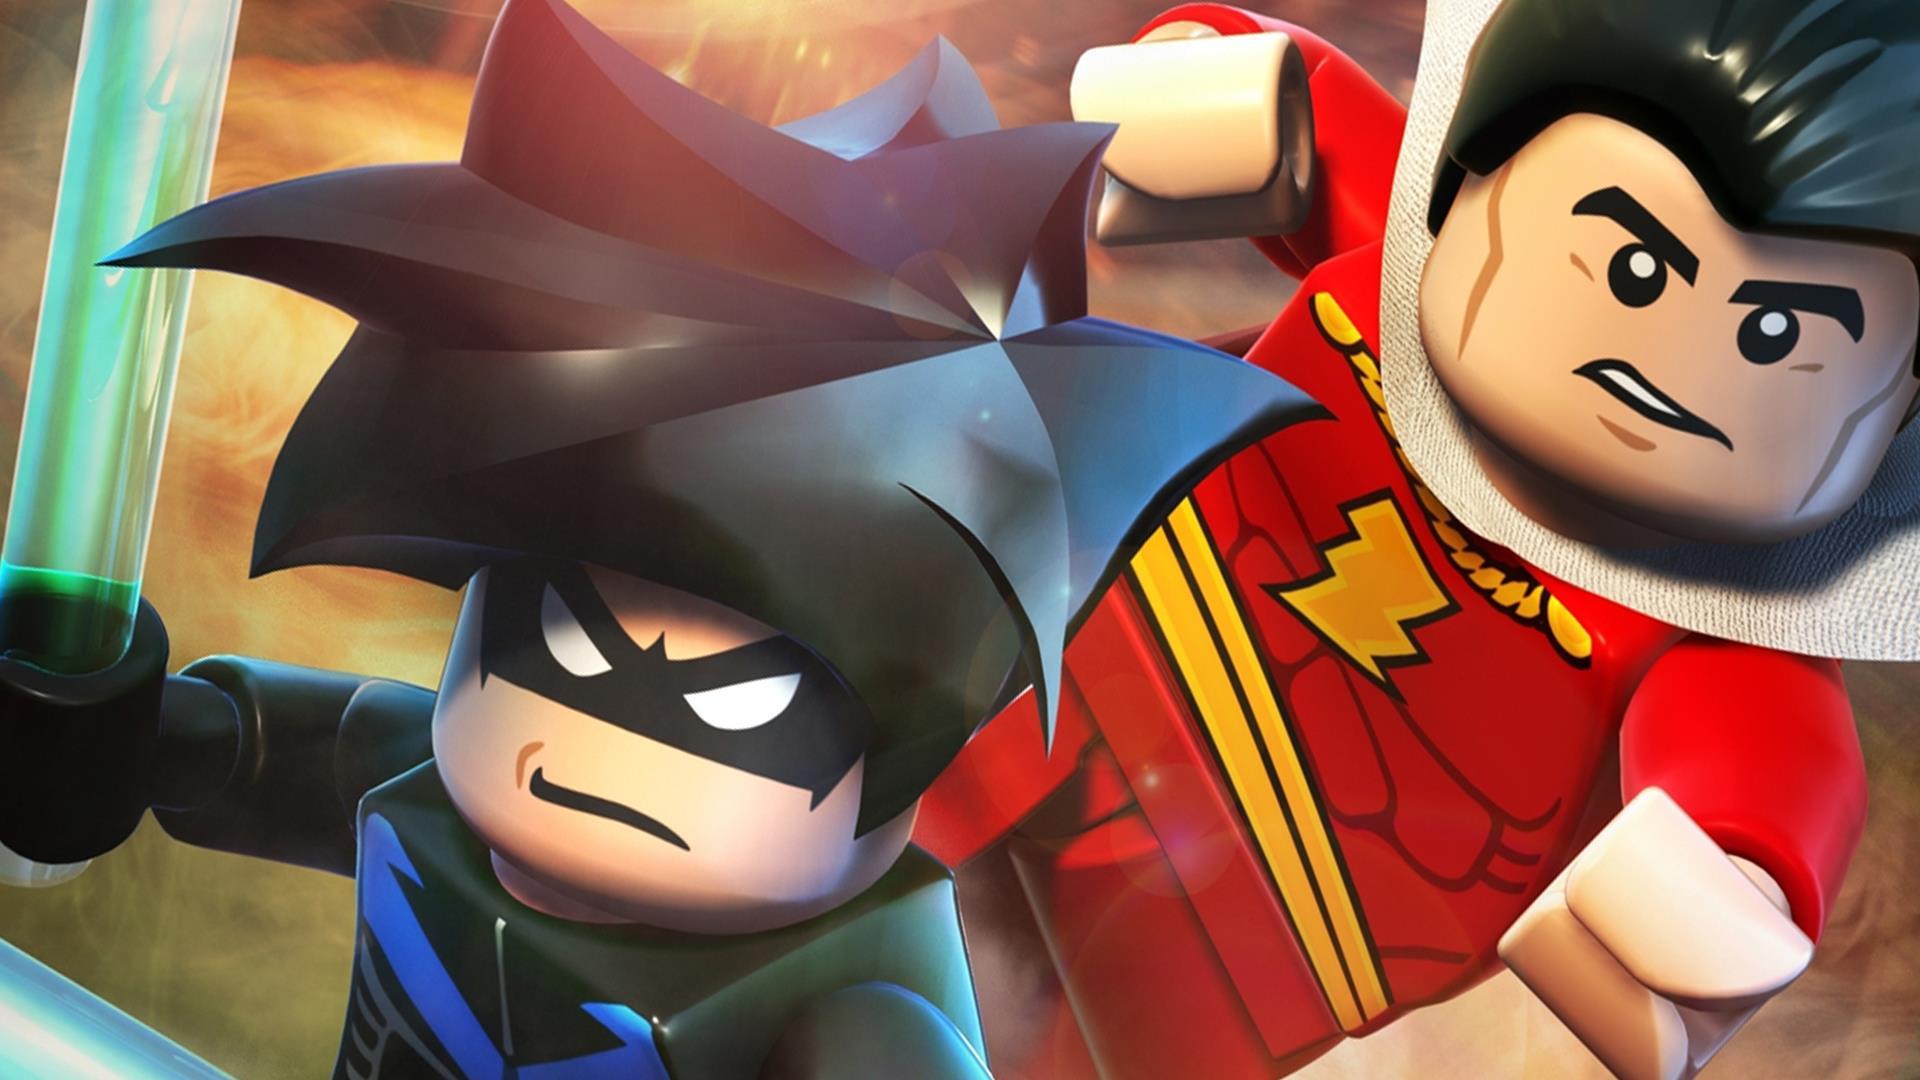 Lego batman 2 dc super heroes details launchbox games database lego batman 2 dc super heroes fanart background voltagebd Image collections